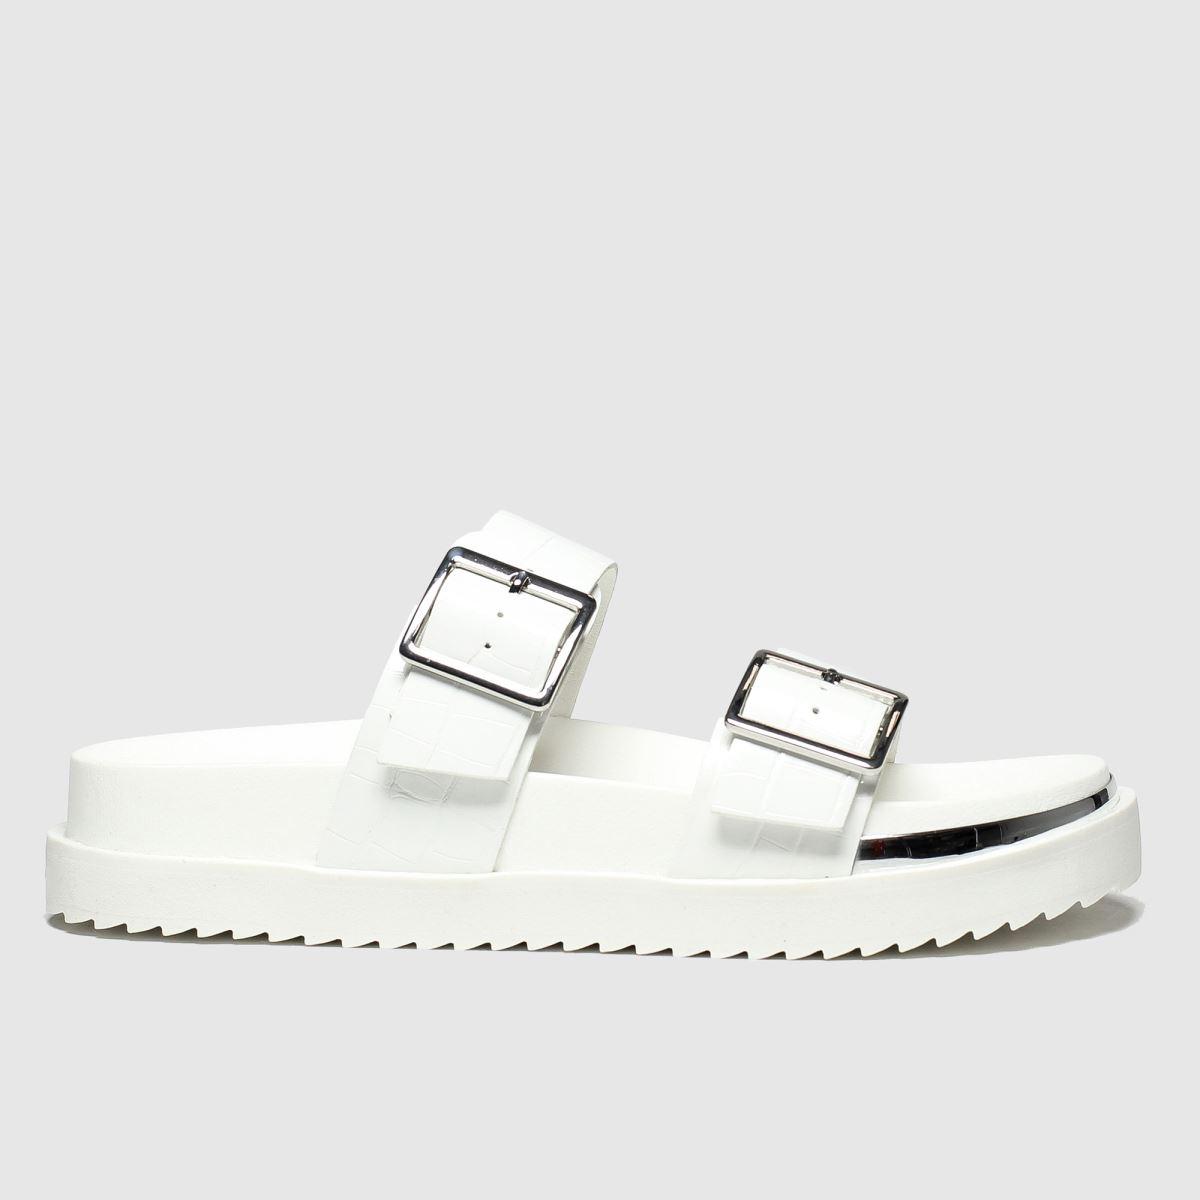 schuh Schuh White Superstitious Sandals